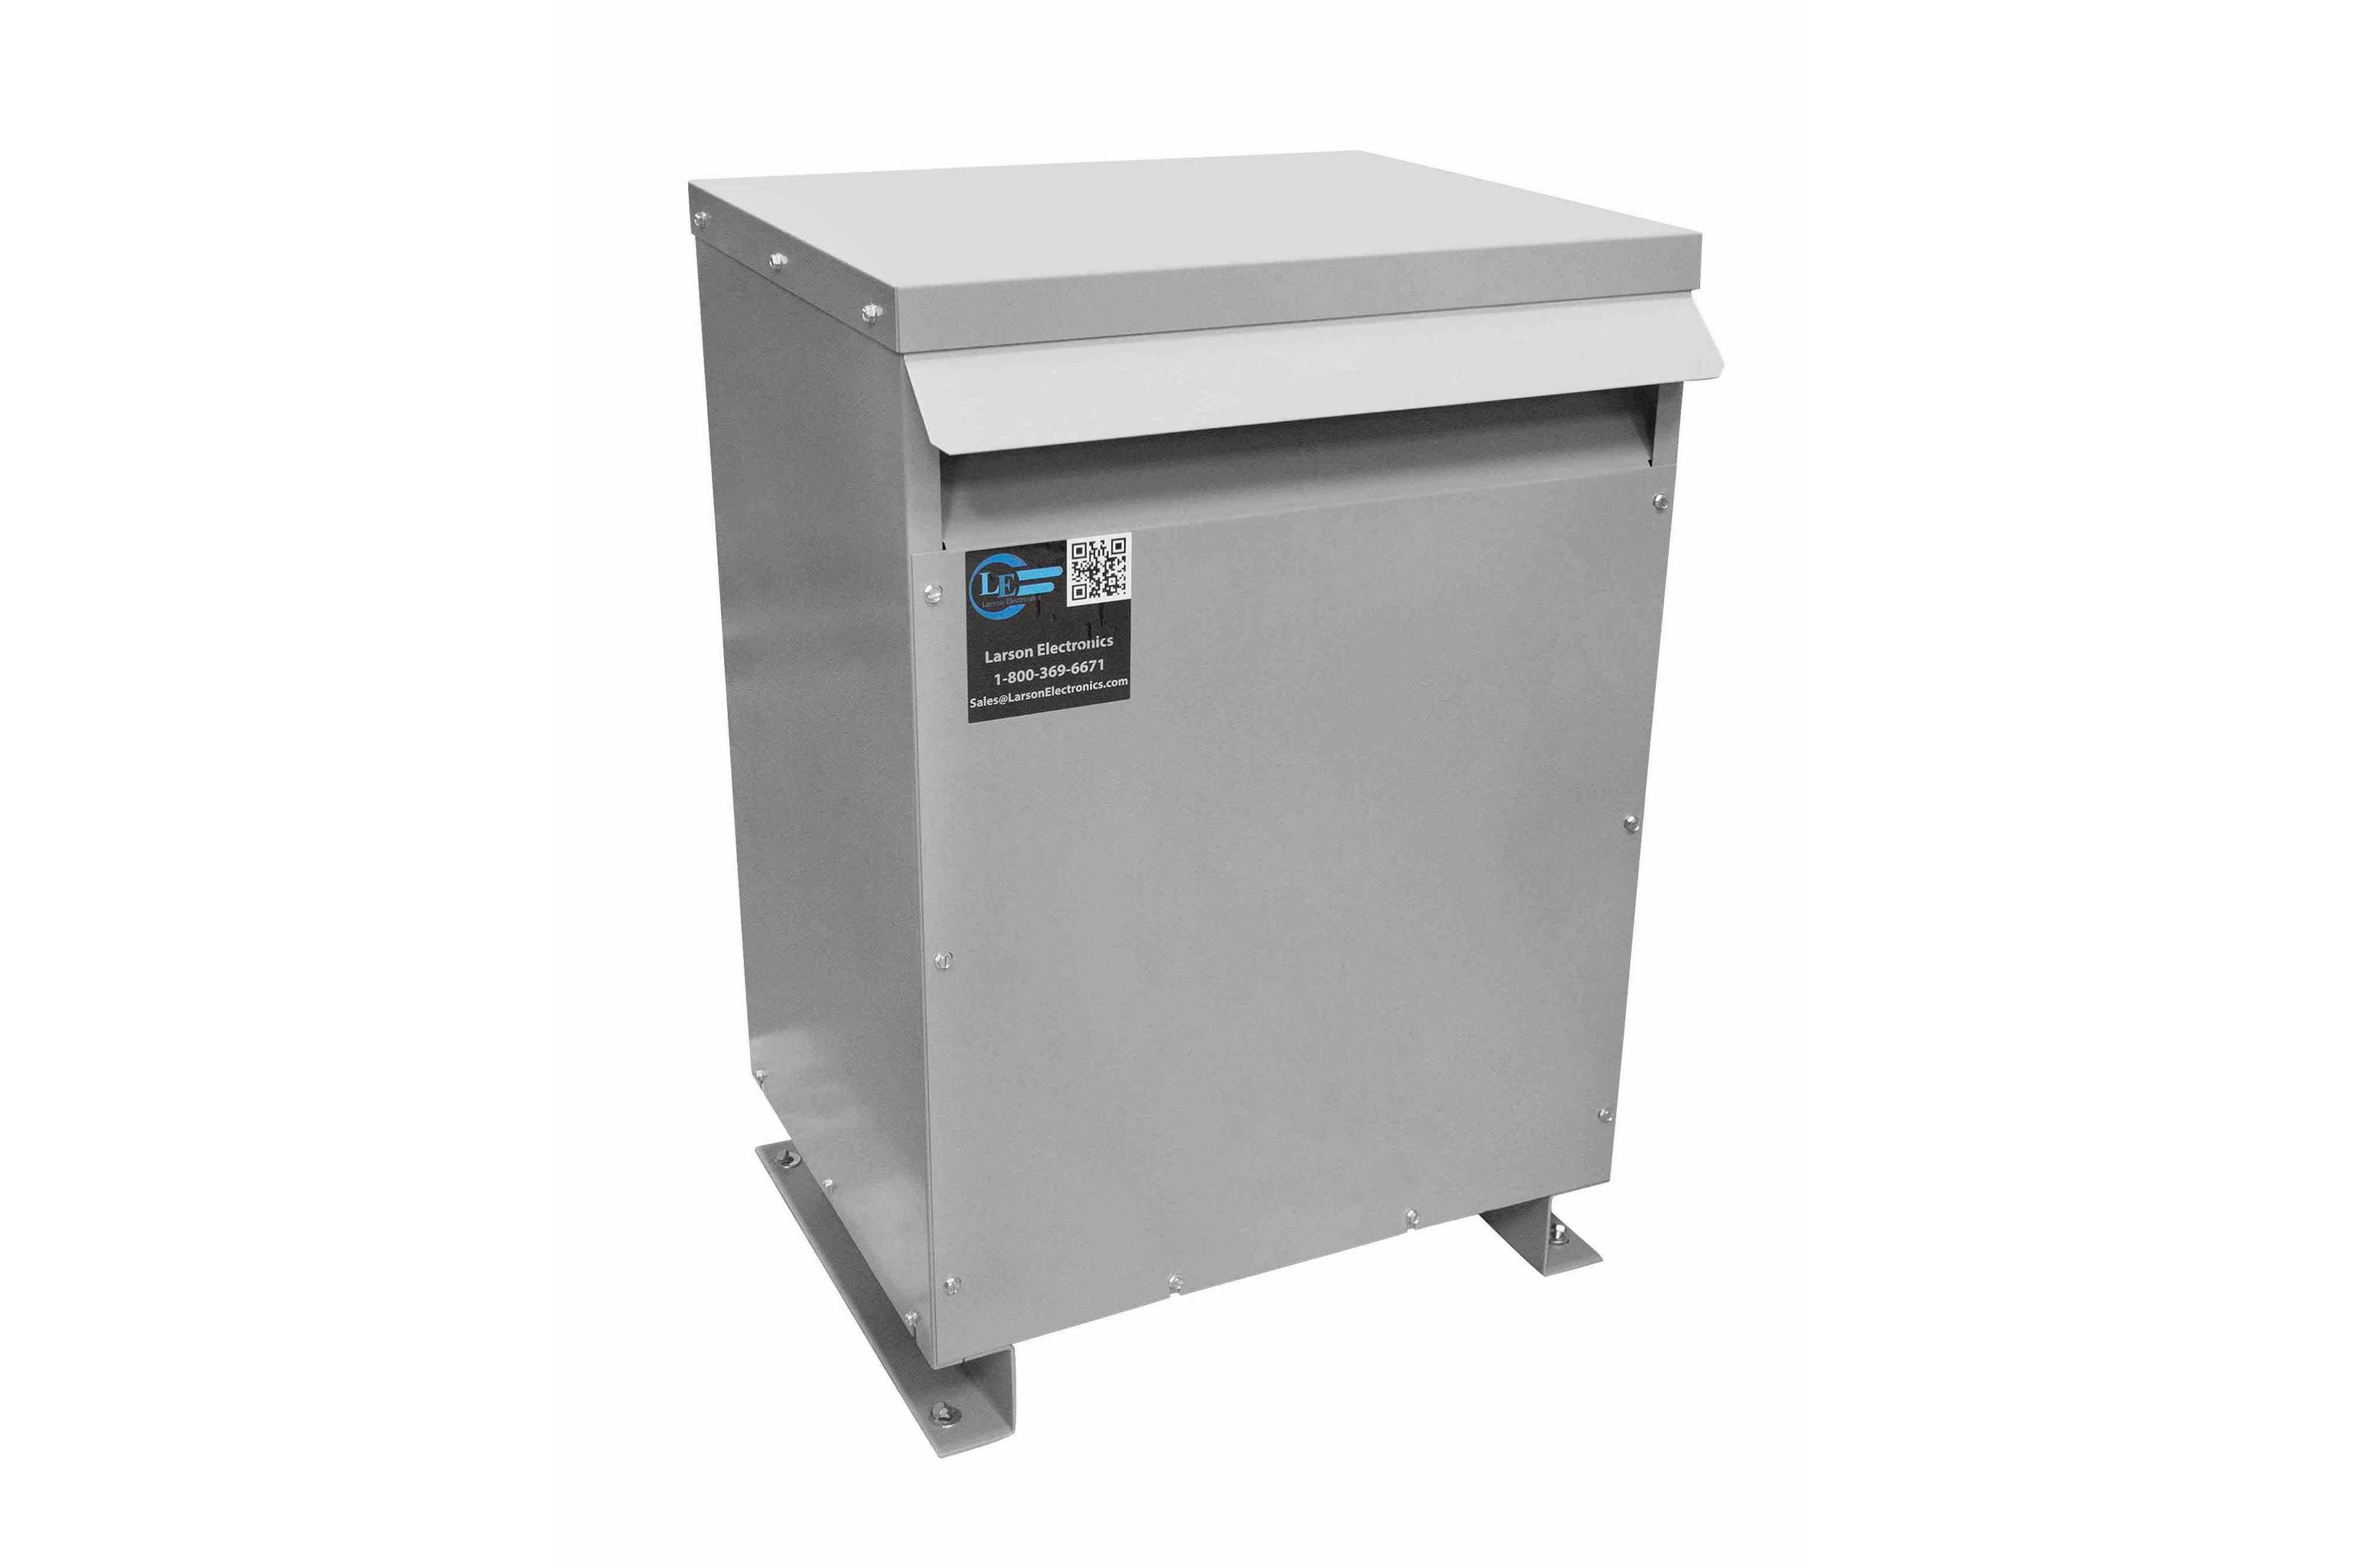 50 kVA 3PH Isolation Transformer, 460V Wye Primary, 575V Delta Secondary, N3R, Ventilated, 60 Hz